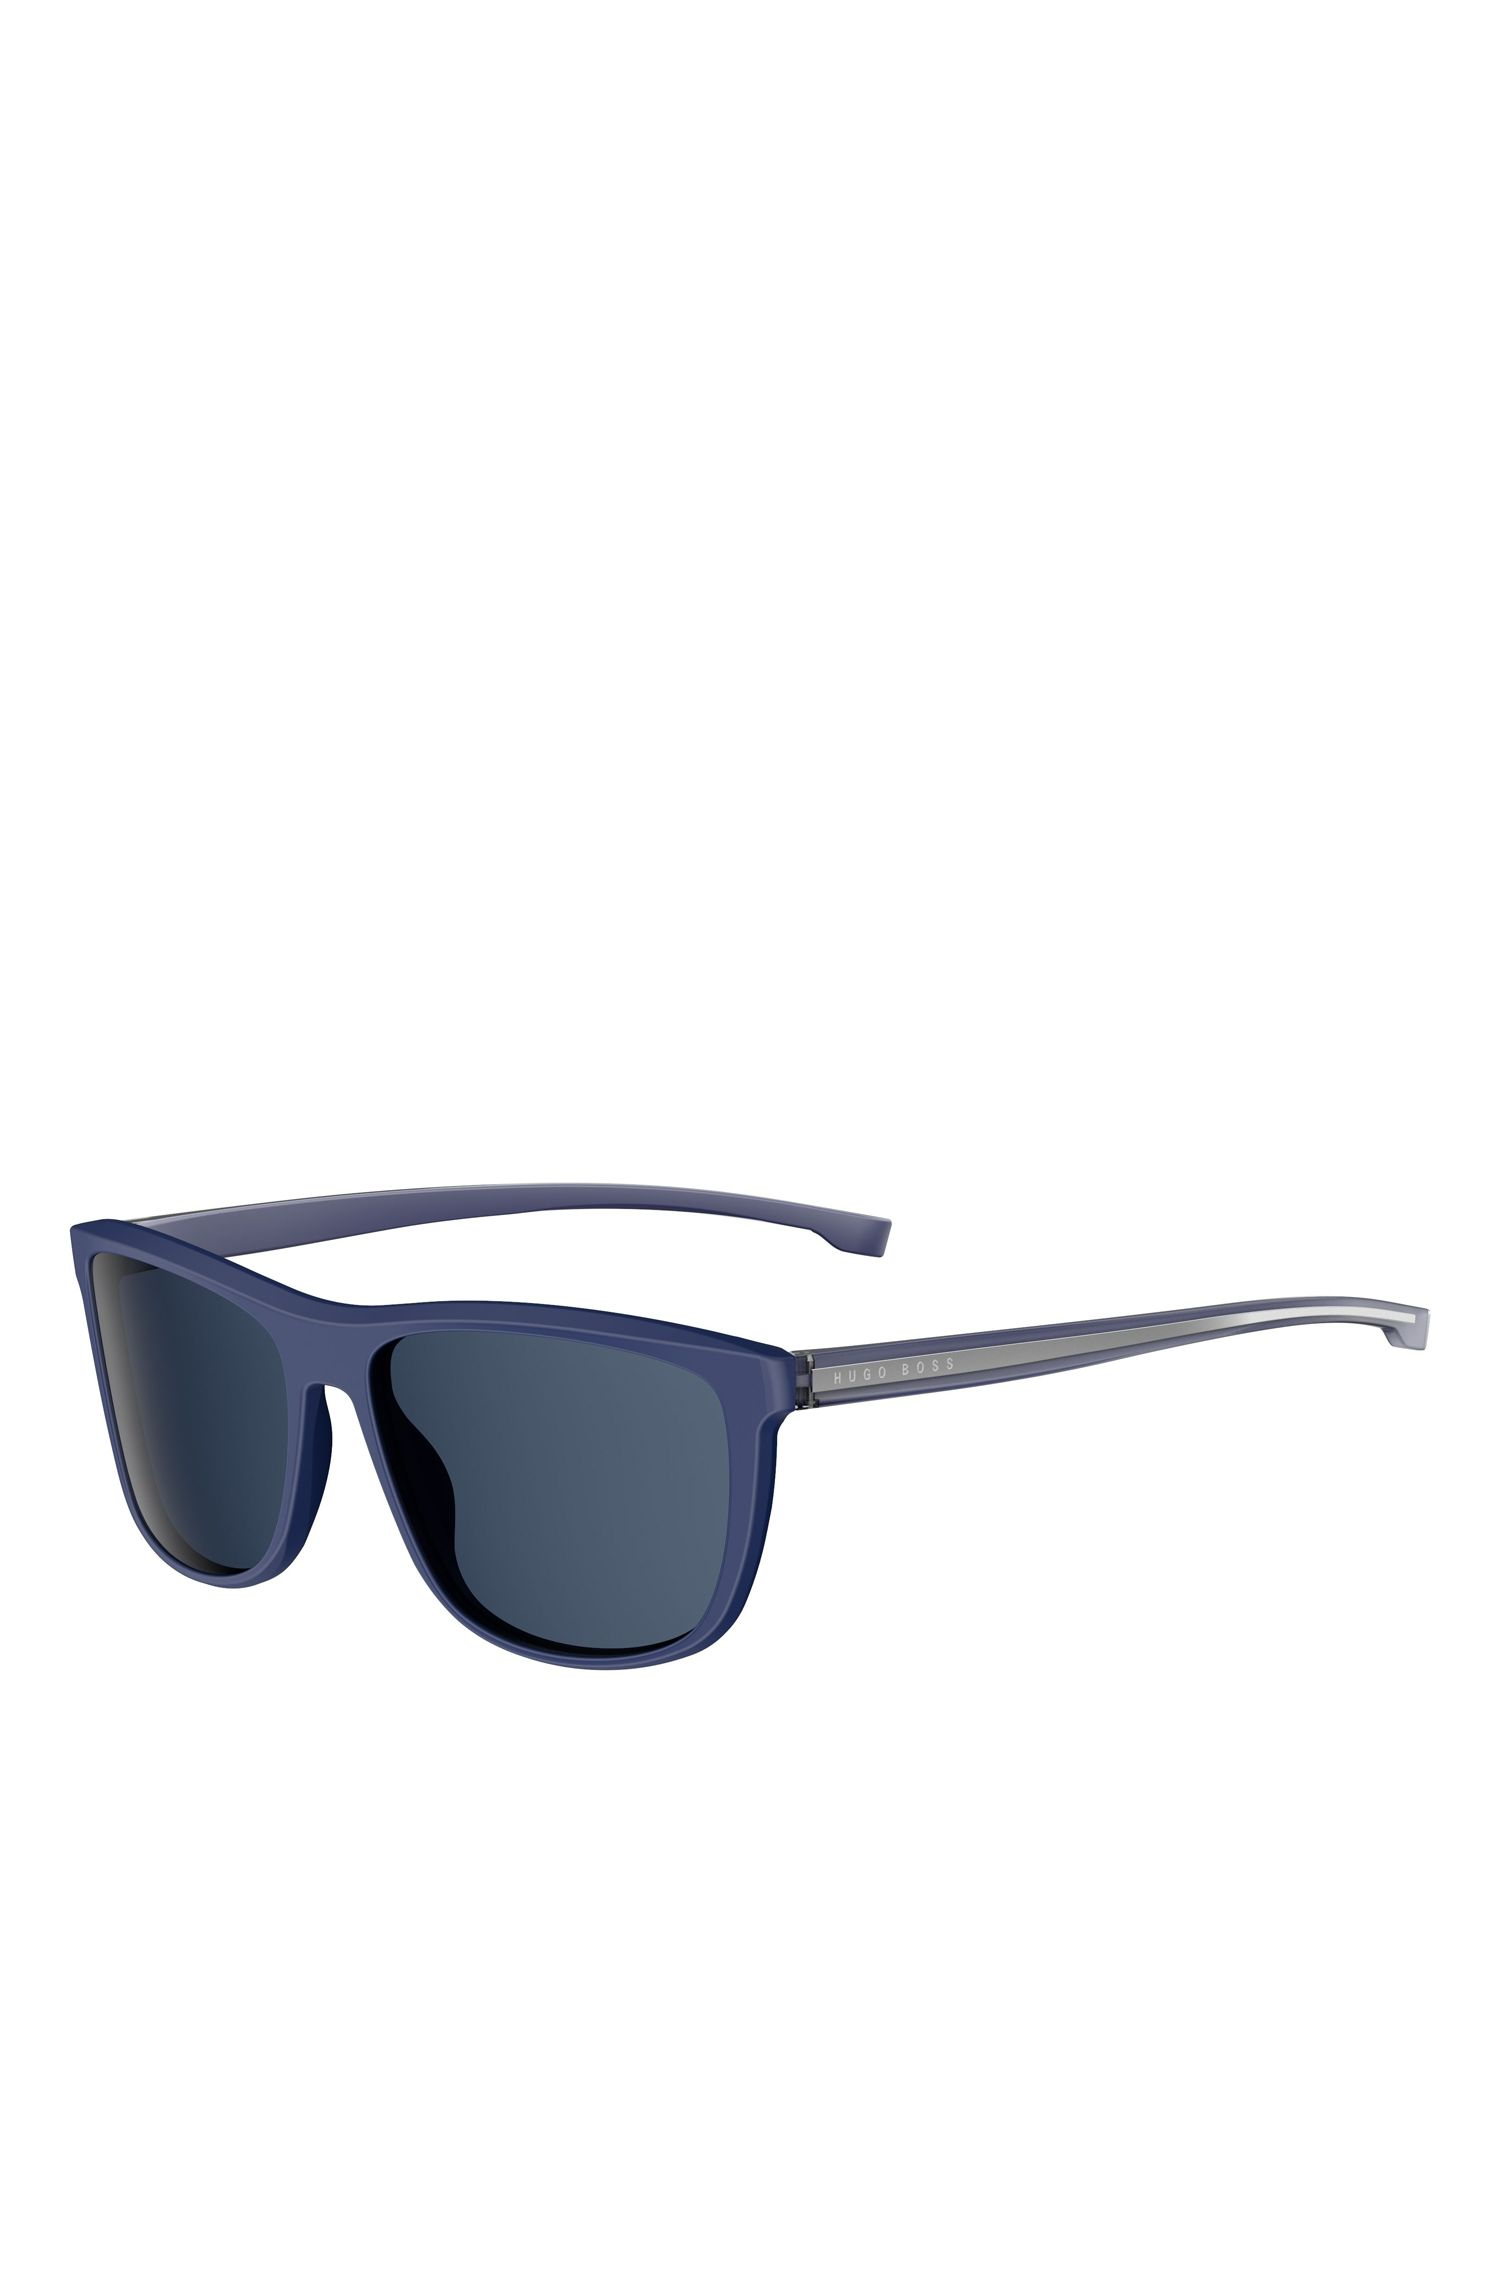 'BOSS 0874S'   Blue Lens Top Bar Sunglasses